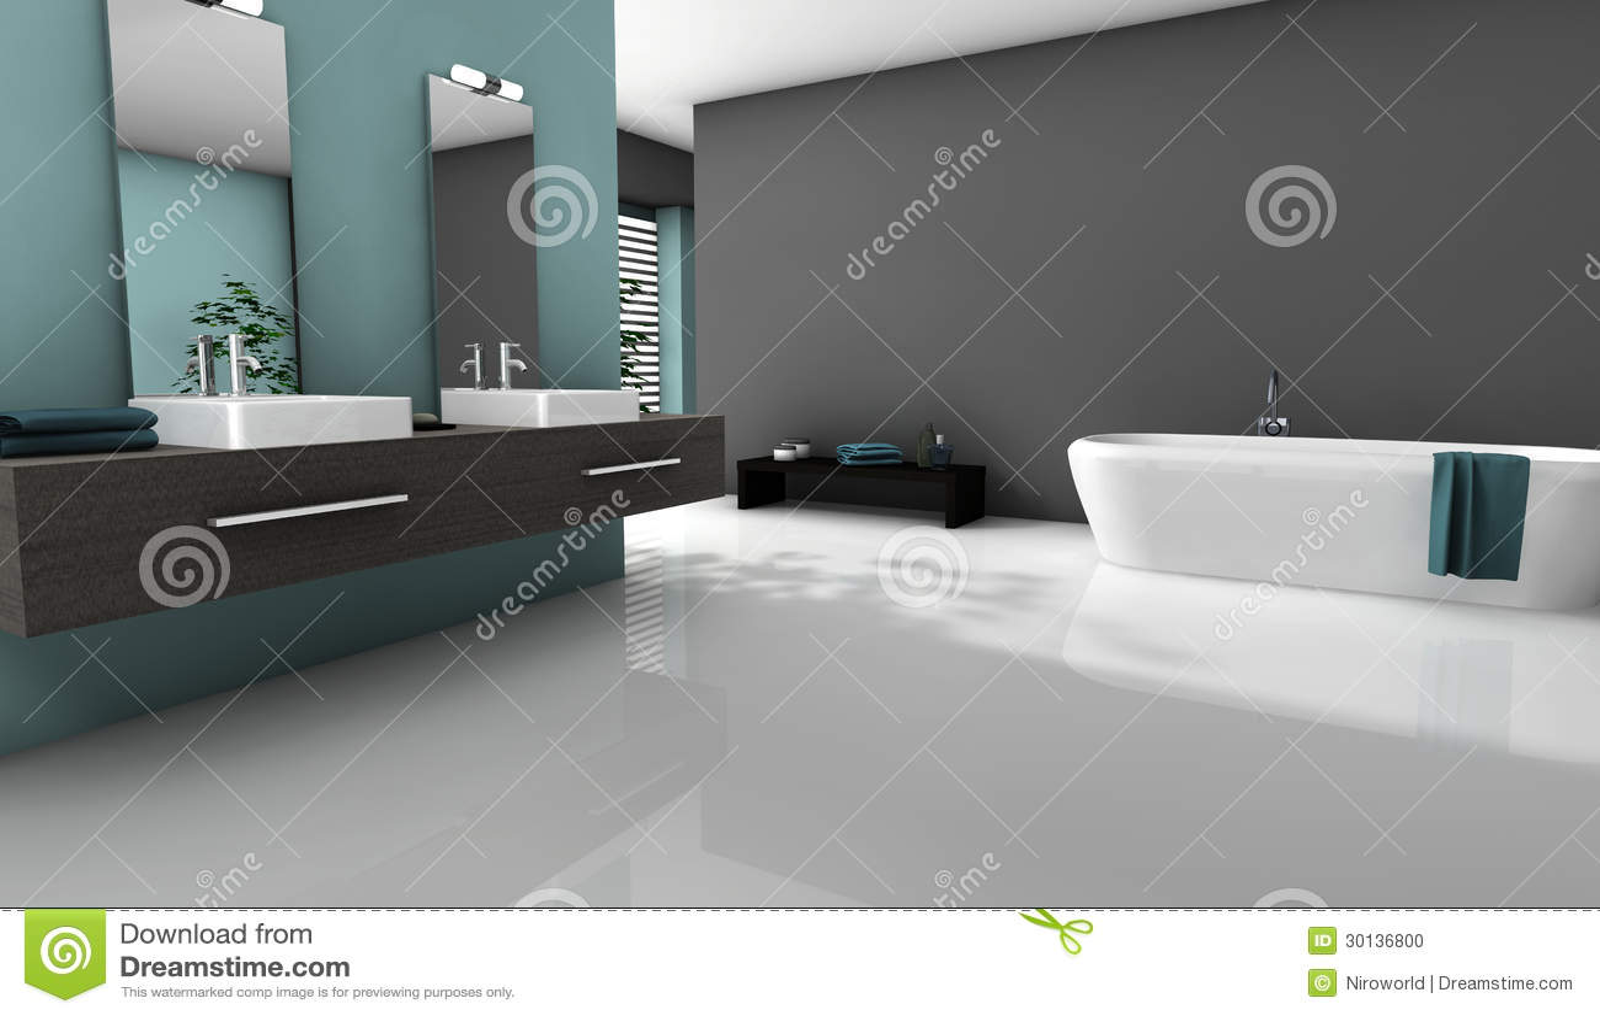 Dise o del hogar del cuarto de ba o stock de ilustraci n for Diseno pisos